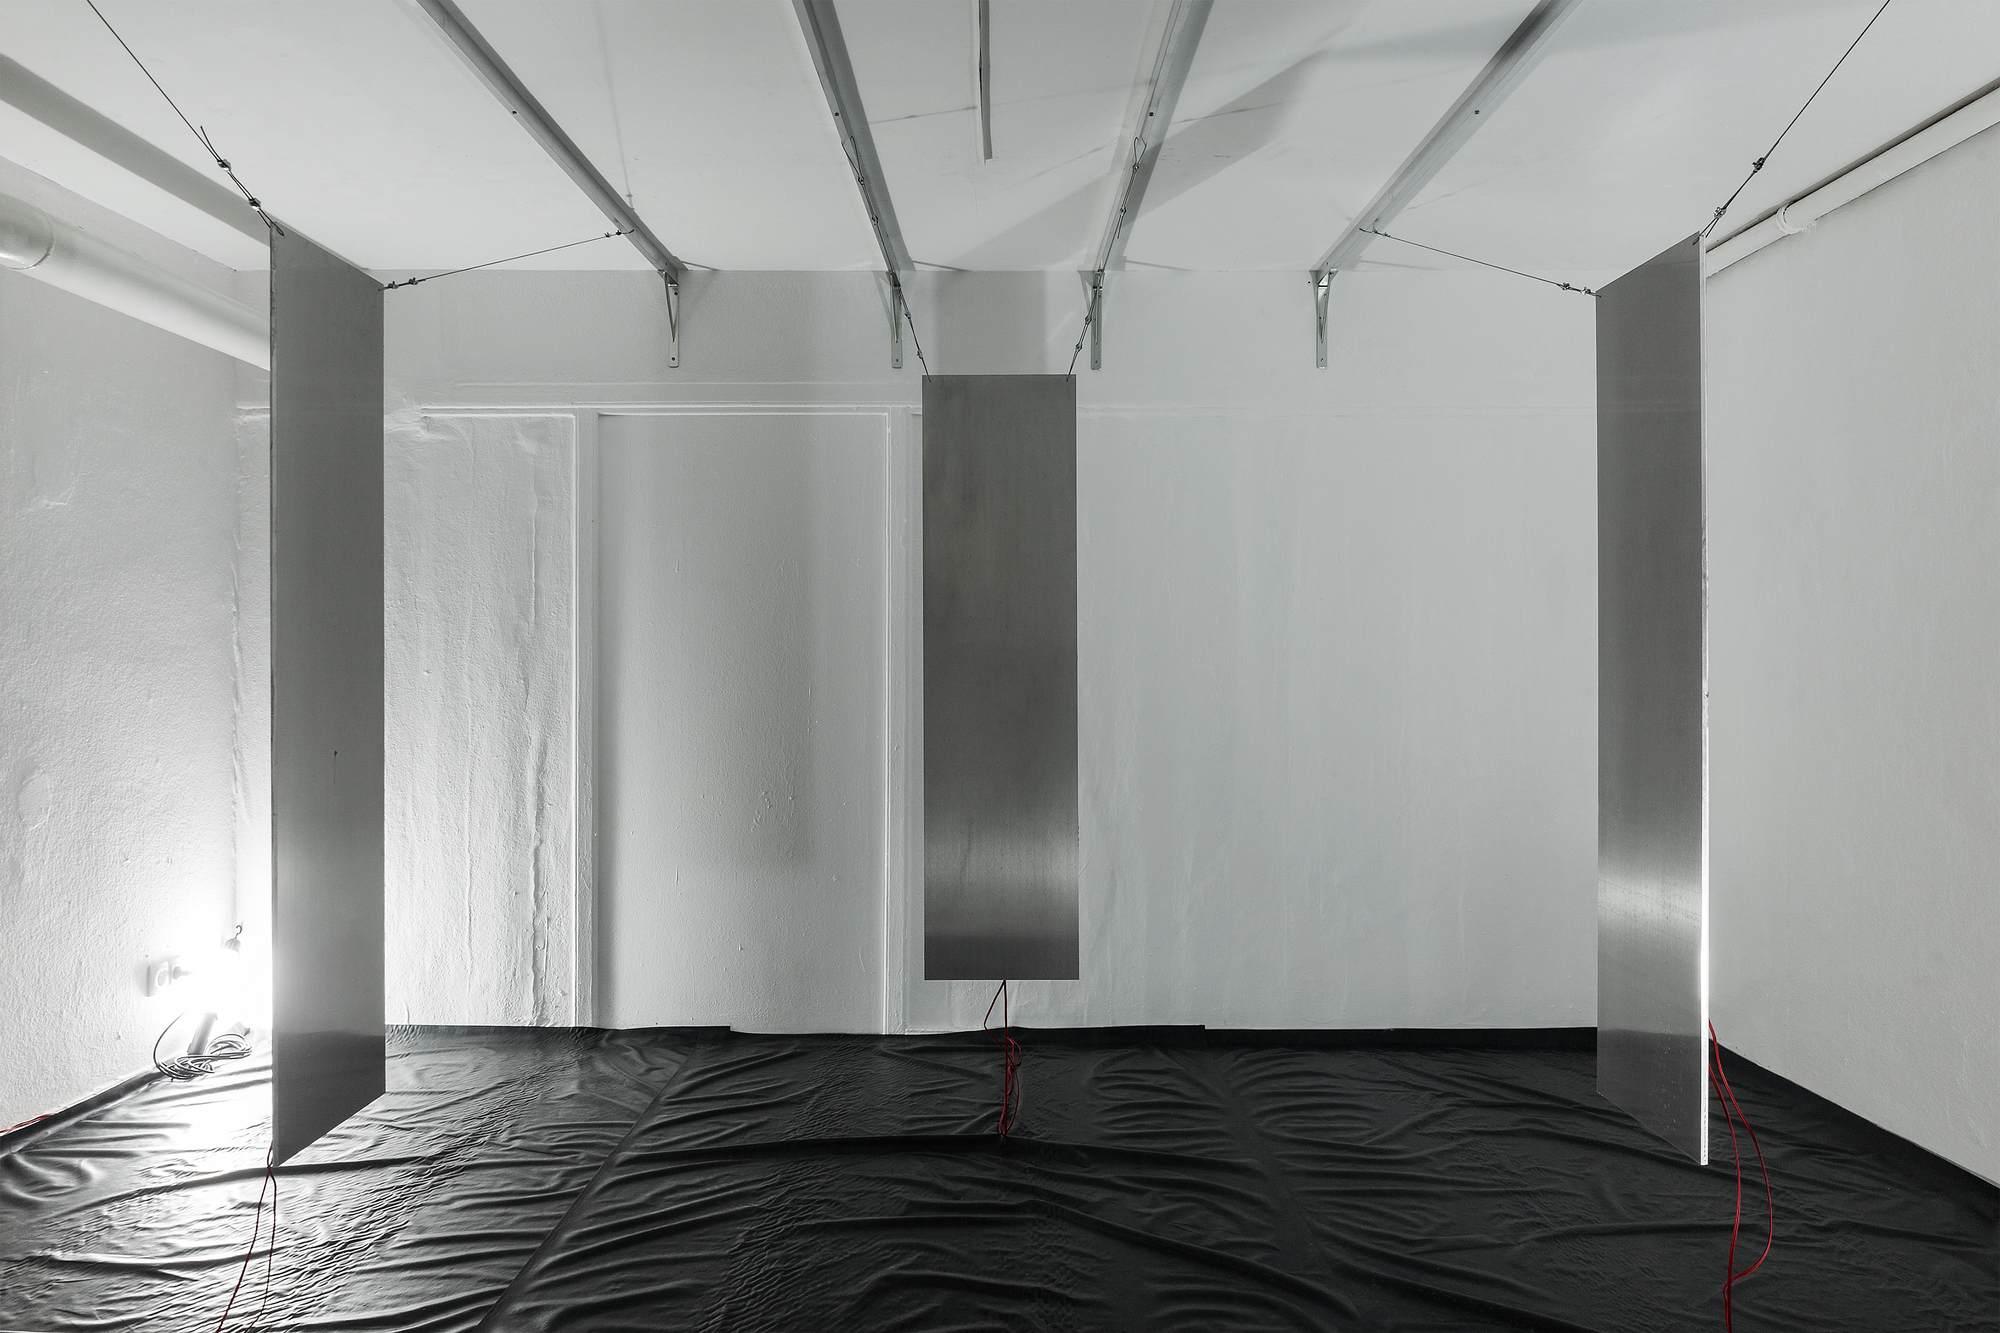 insitu collective Corridor 1: Onkalo